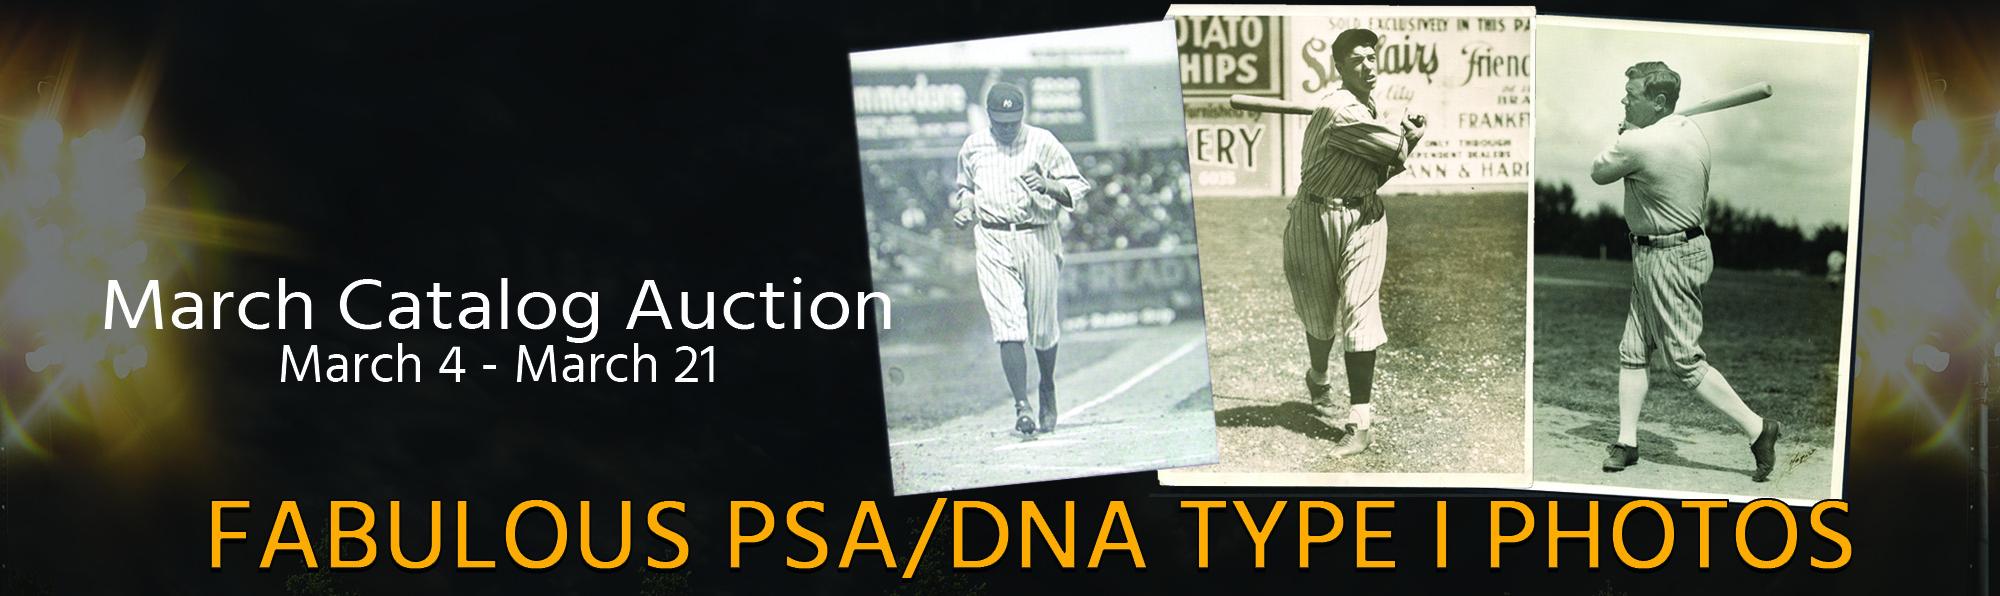 Fabulous PSA/DNA Type I Photographs